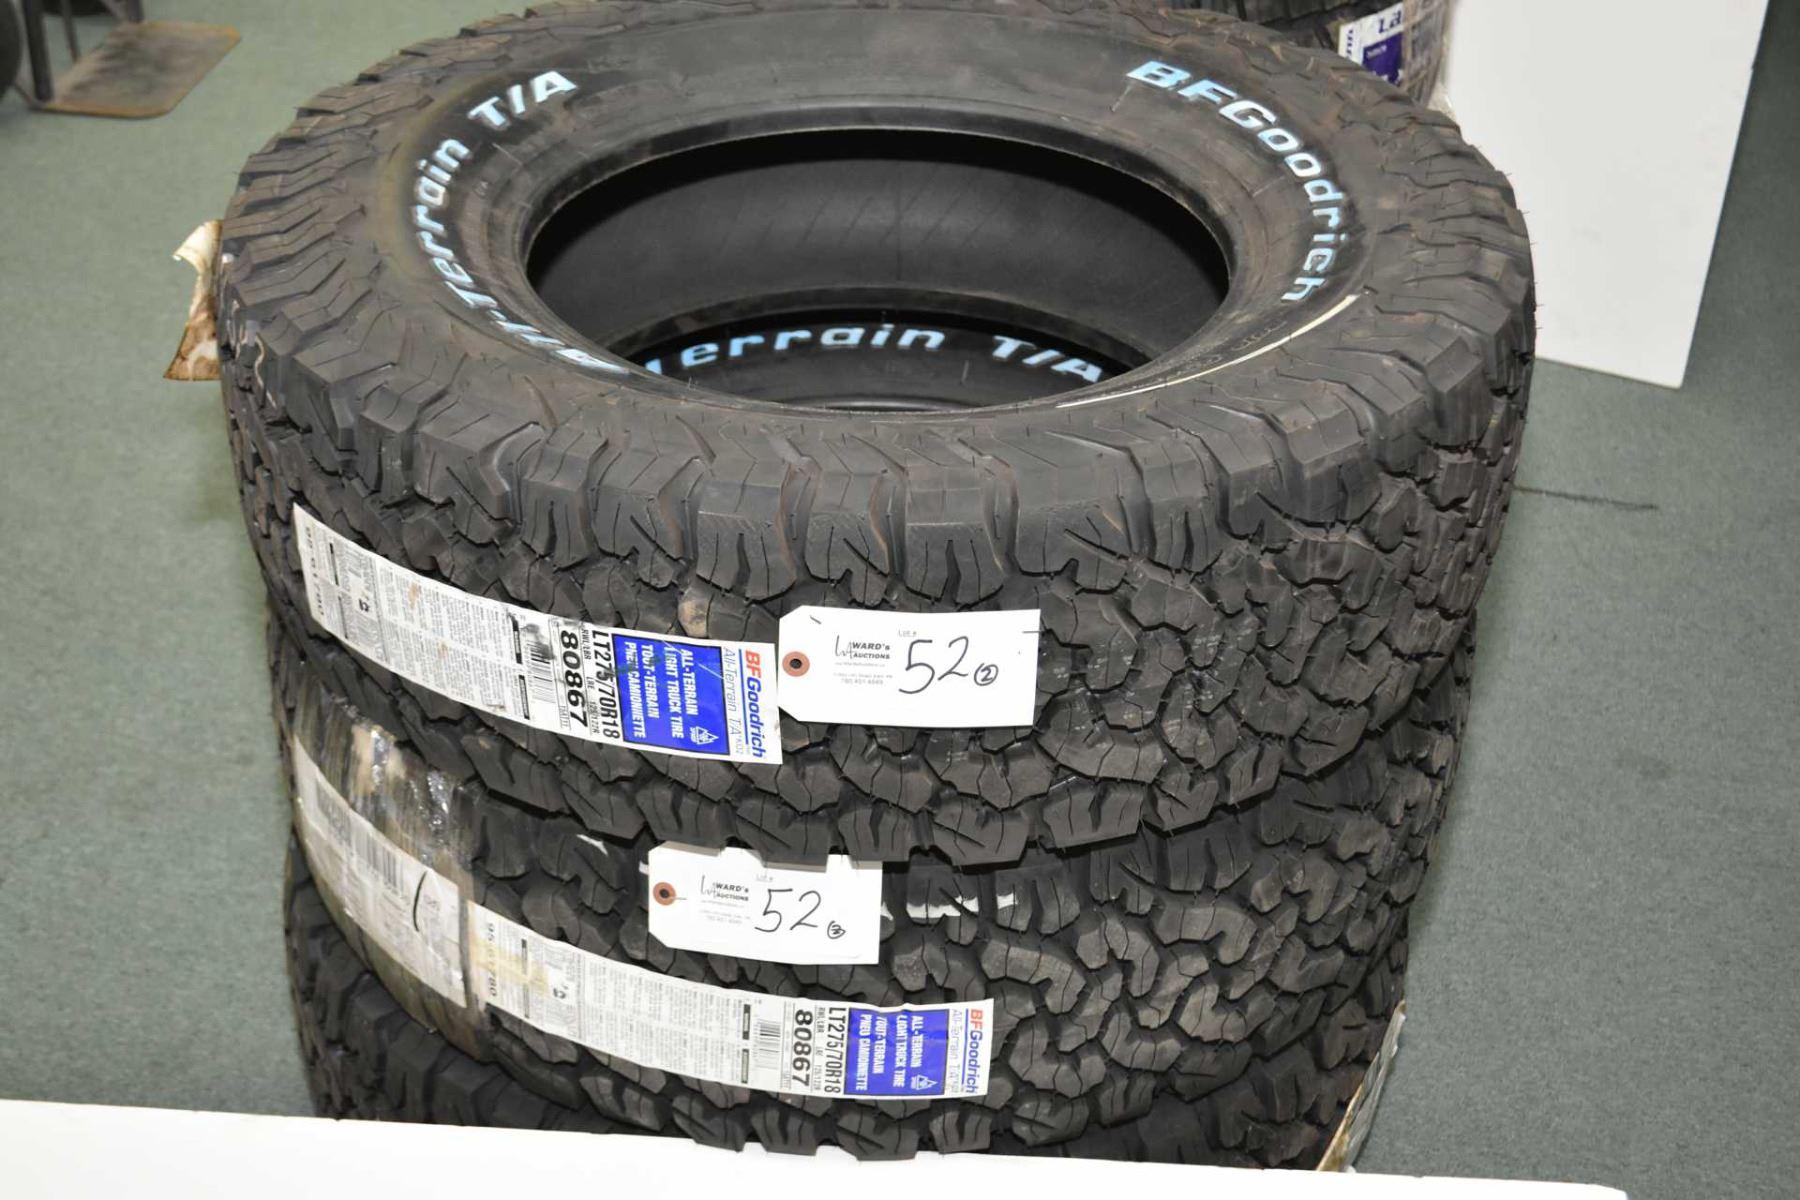 Pair of brand new BF Goodrich All Terrain T A light truck tires